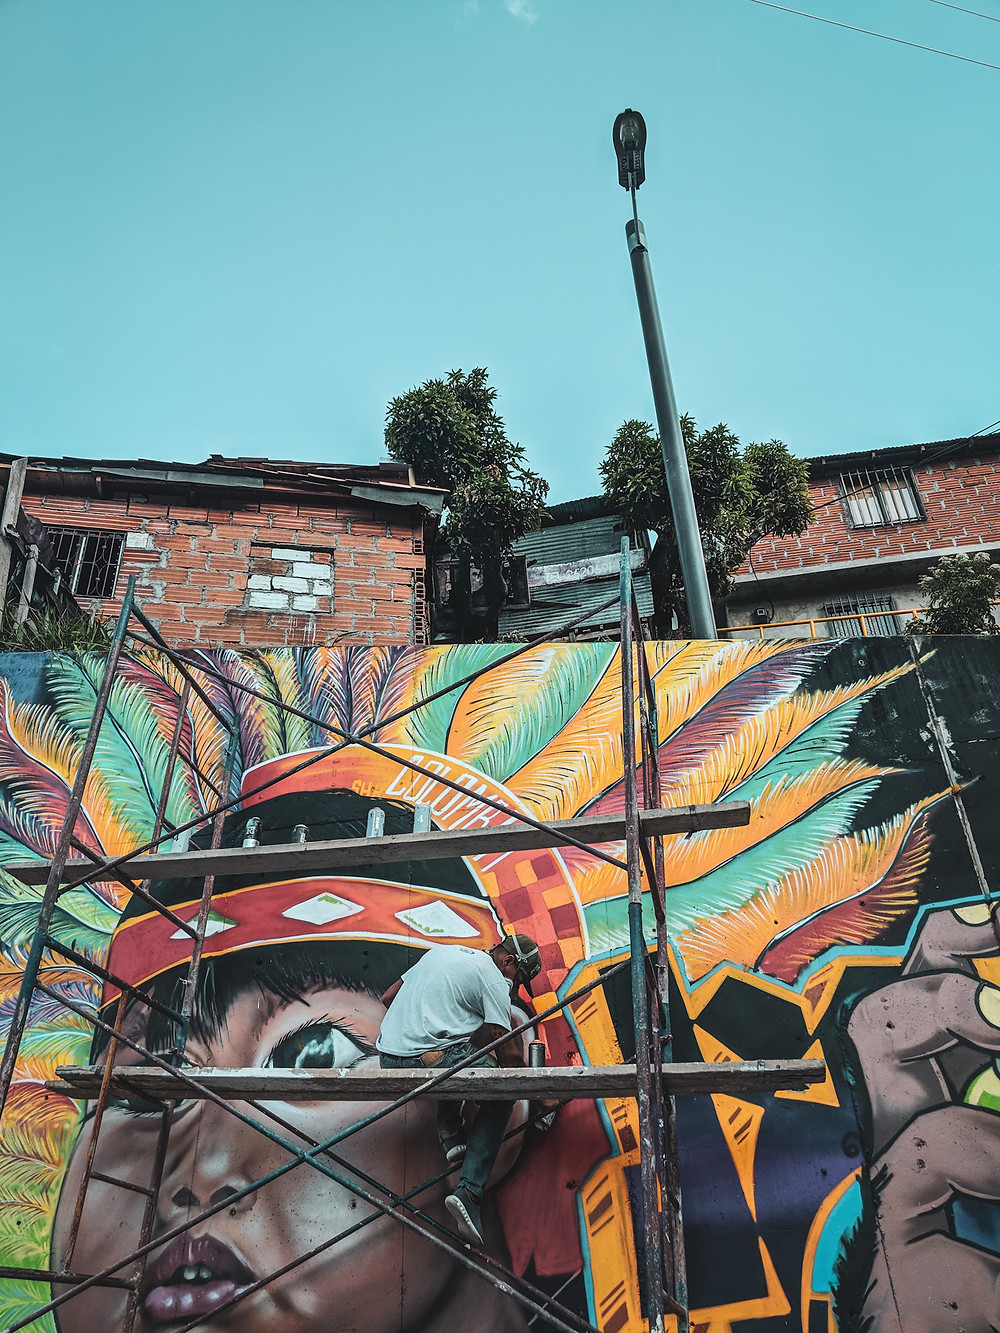 An artist creating a graffiti mural in Comuna 13 in Medellín, Colombia.